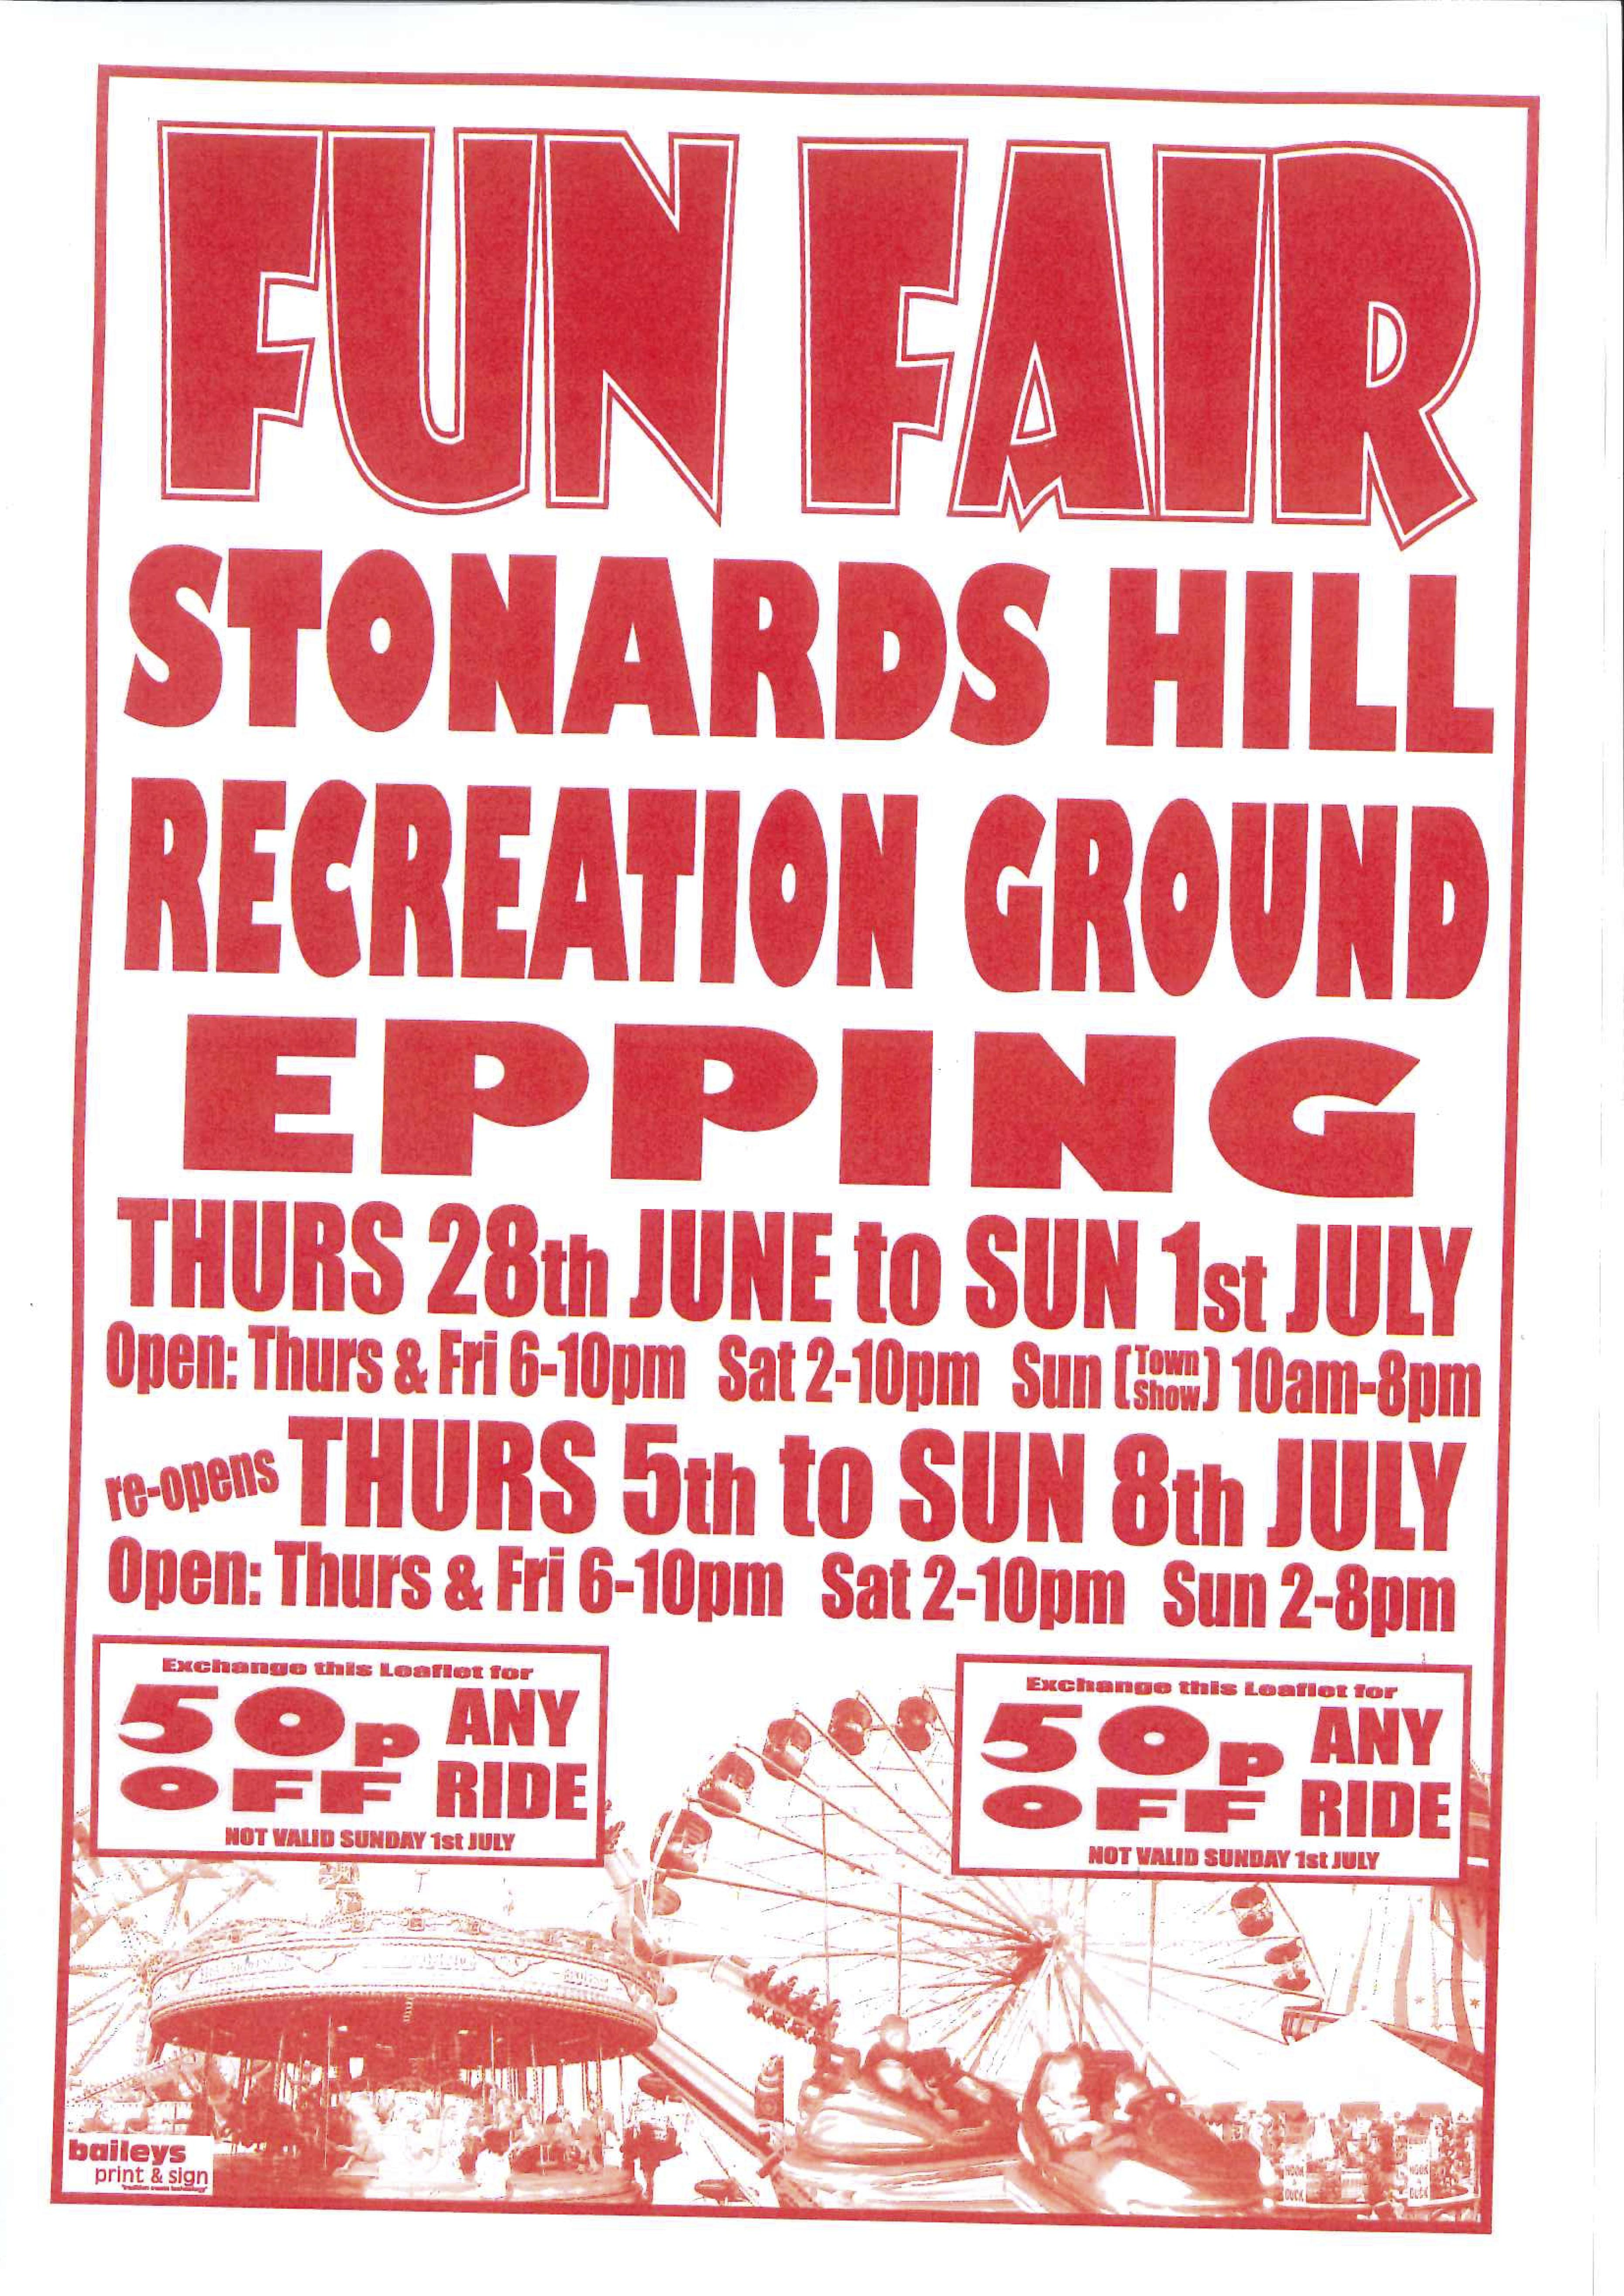 stonards hill recreation ground fun fair june july 2018 epping town council